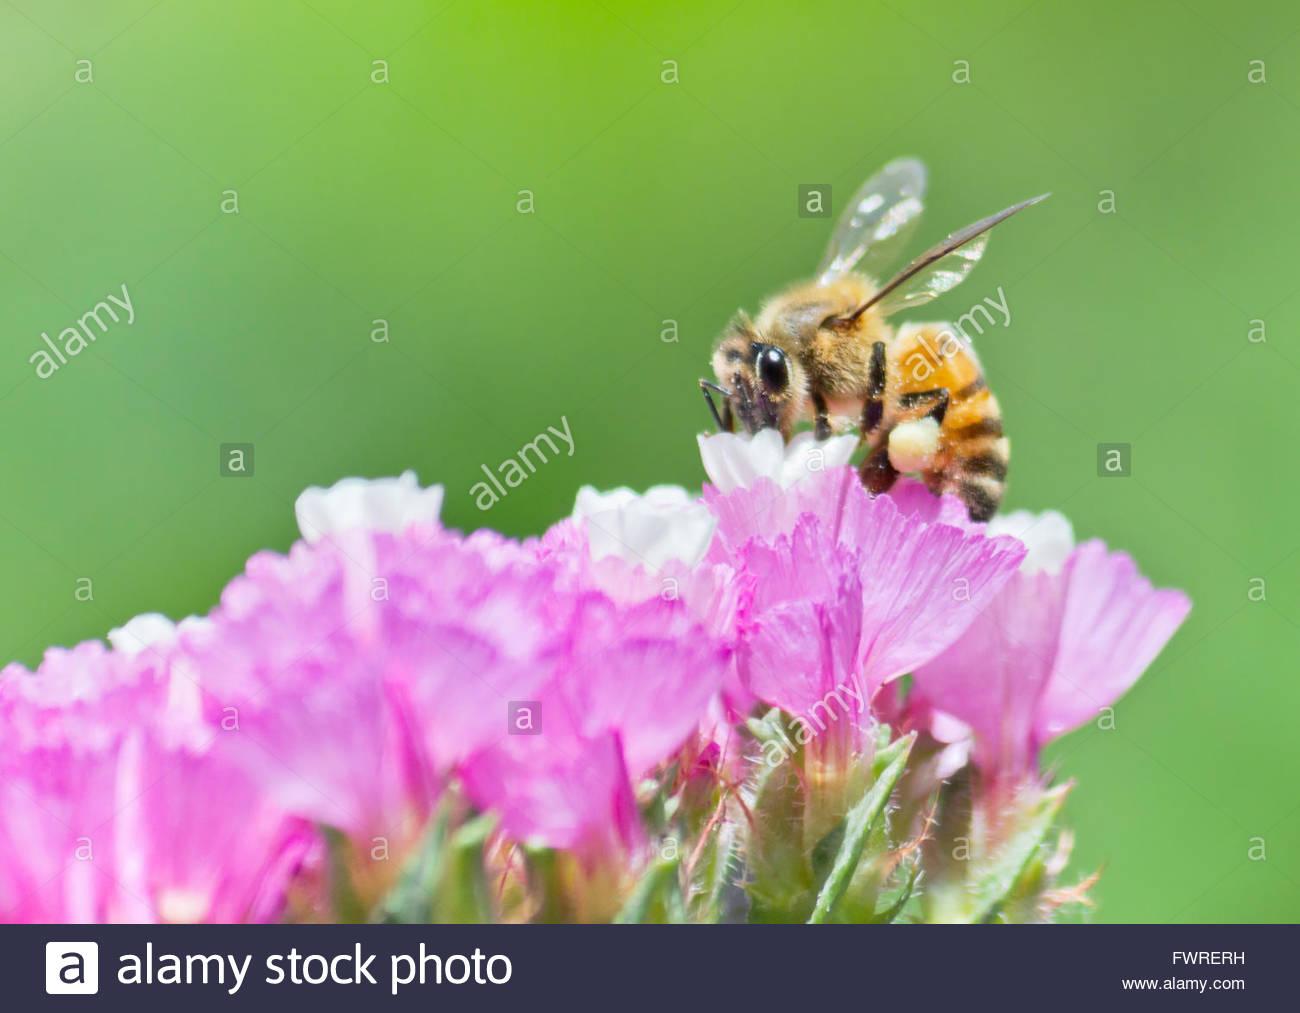 Honeybee collecting pollen from pink statice flower - Stock Image